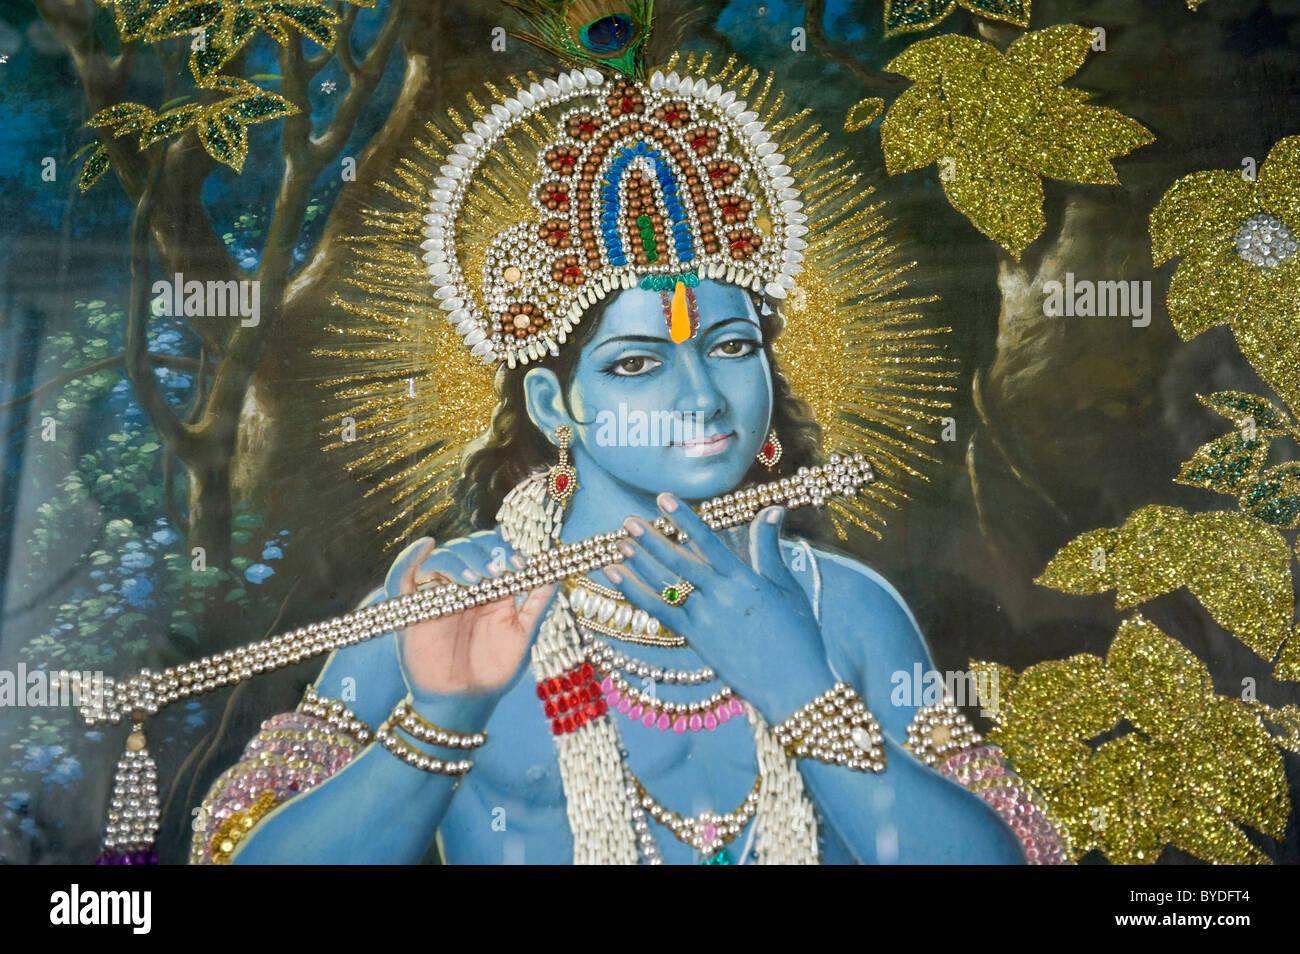 Hinduism, painting of Lord Krishna with flute, Durgiana Mandir Vishnu Temple, Amritsar, Punjab, India, South Asia - Stock Image